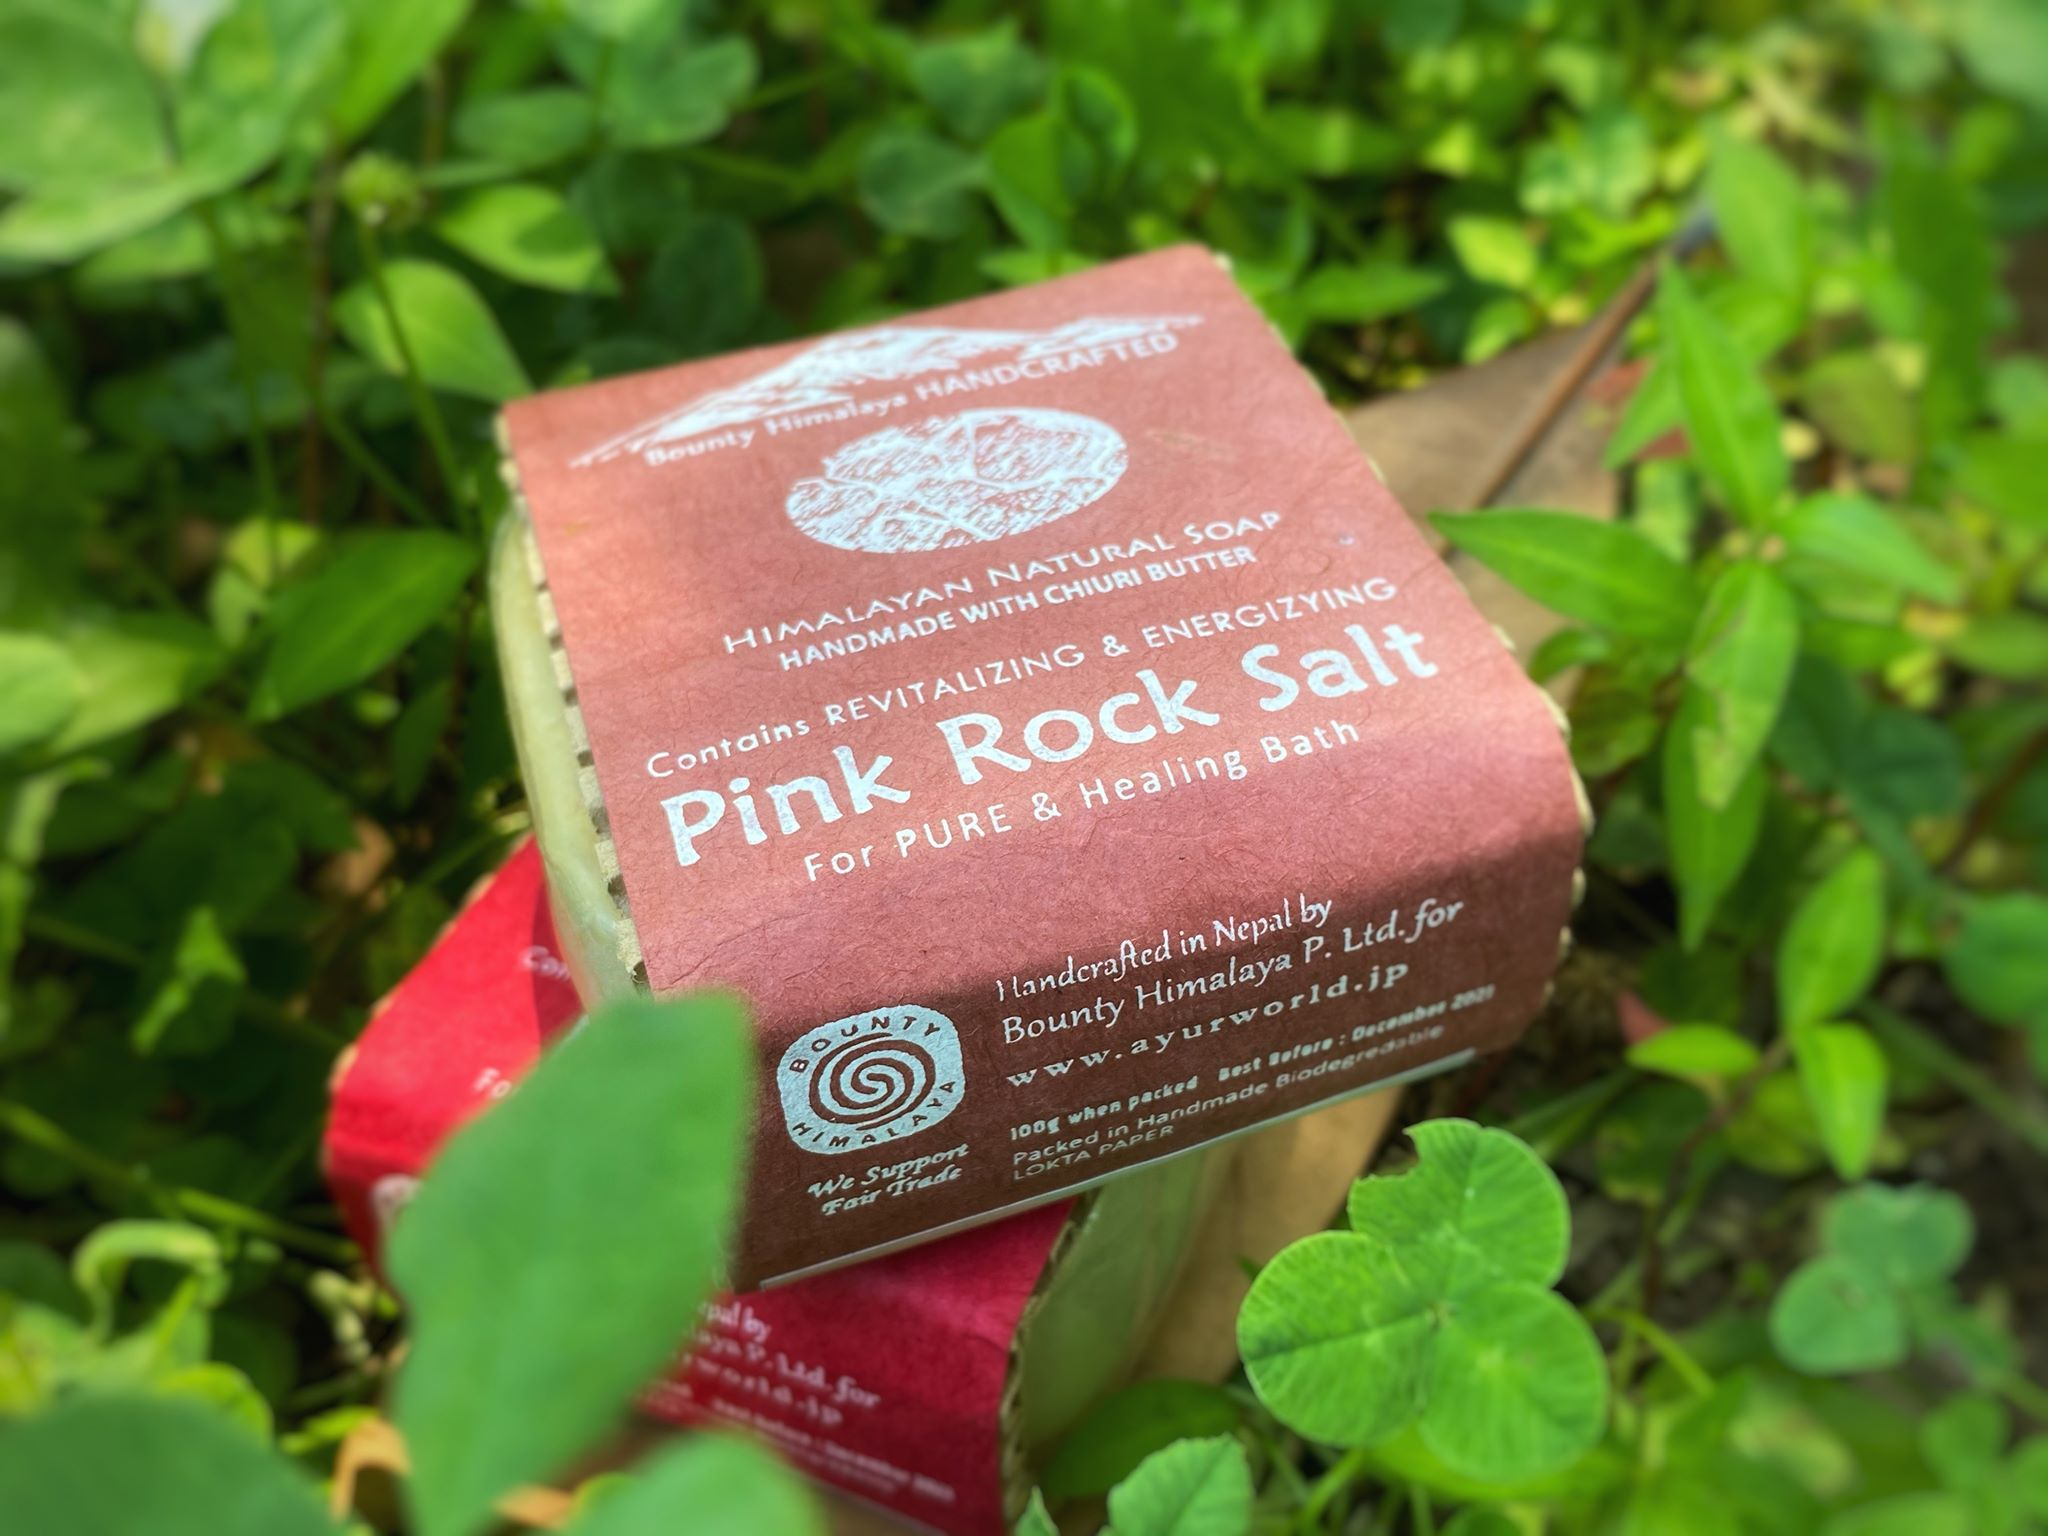 Pink Rock Saltの作用